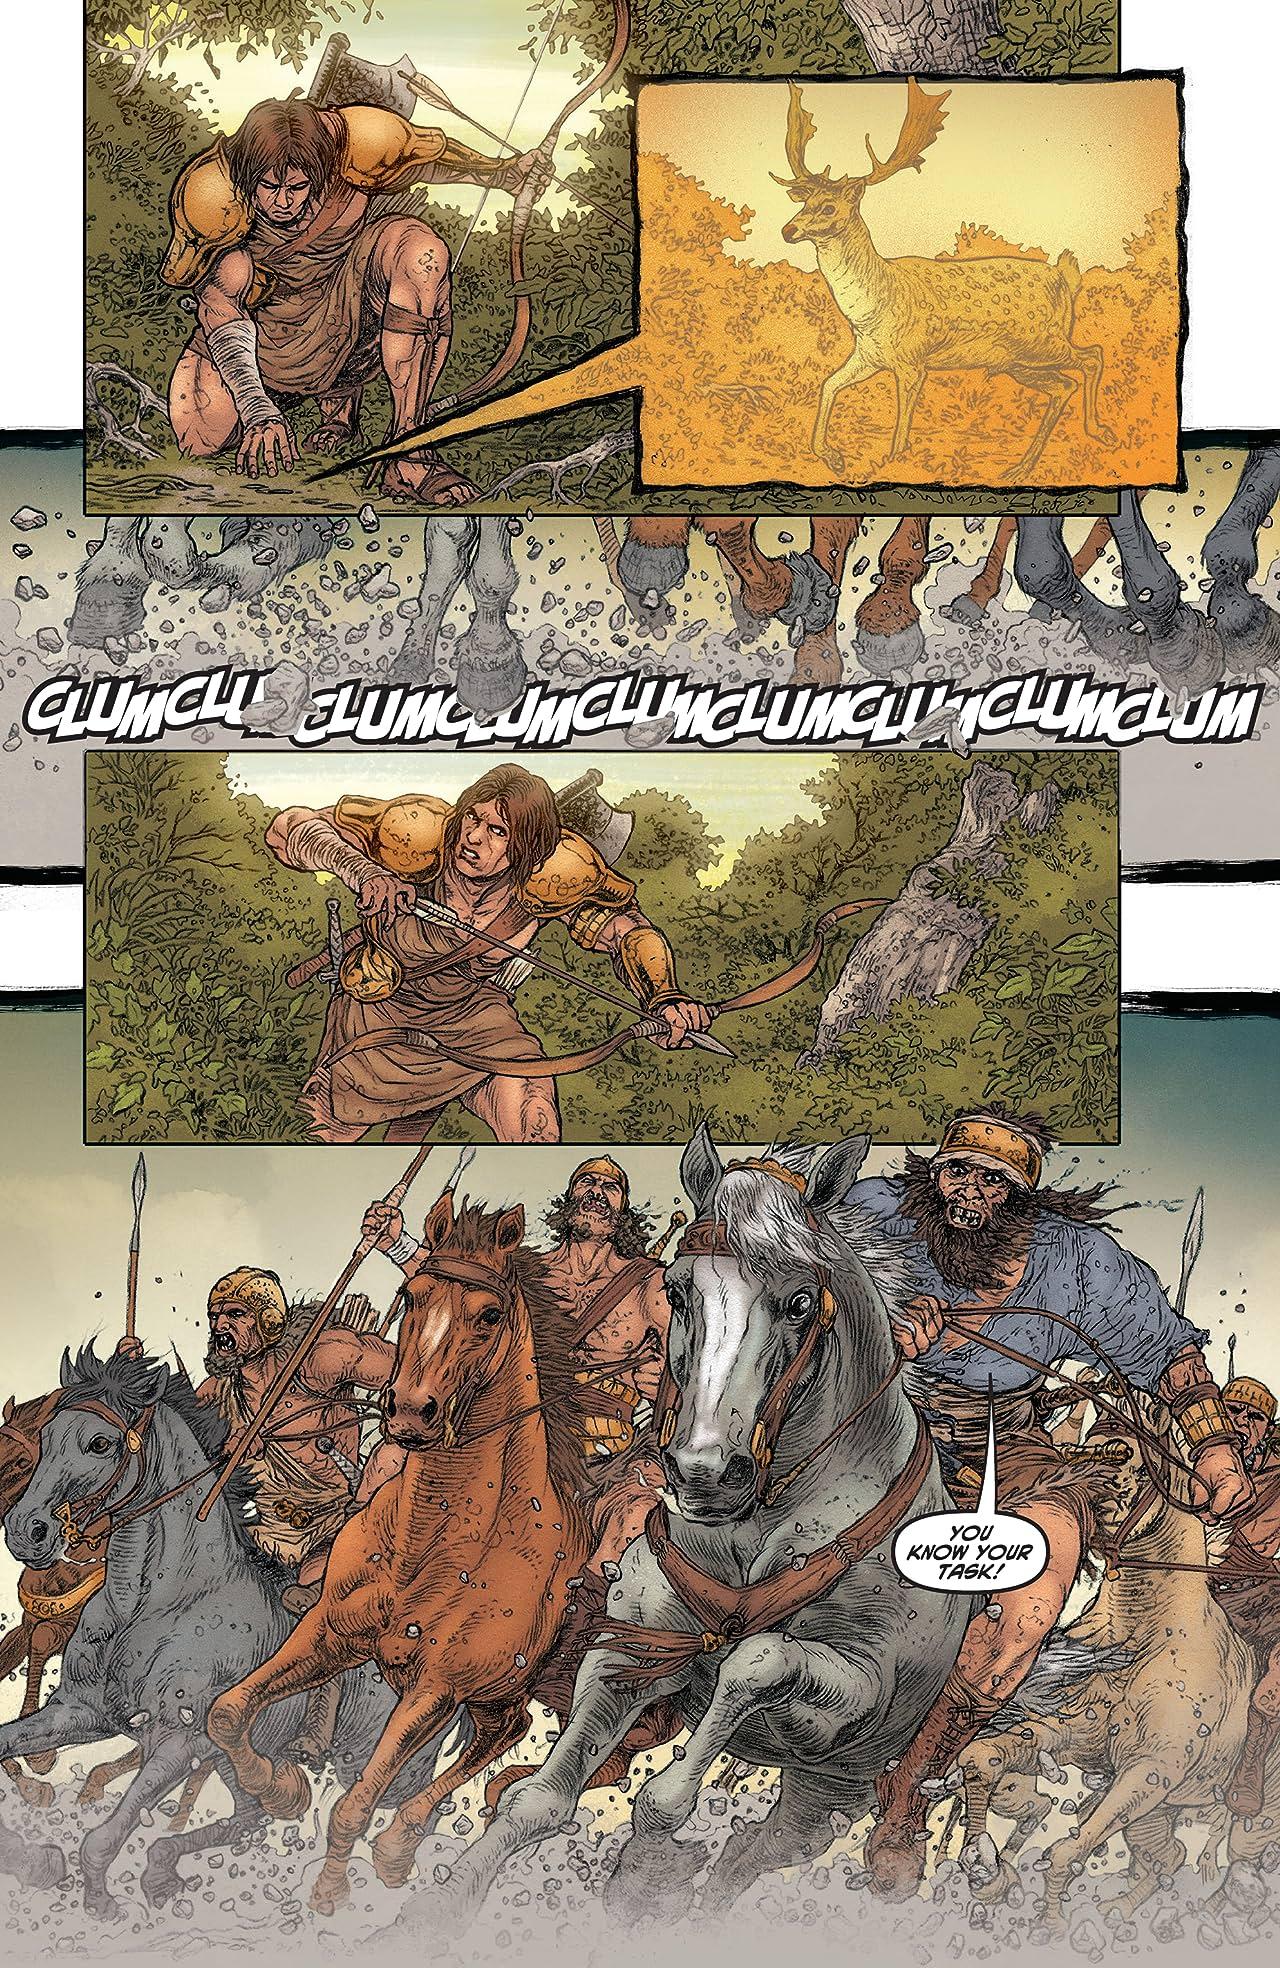 Wrath of the Eternal Warrior Vol. 2